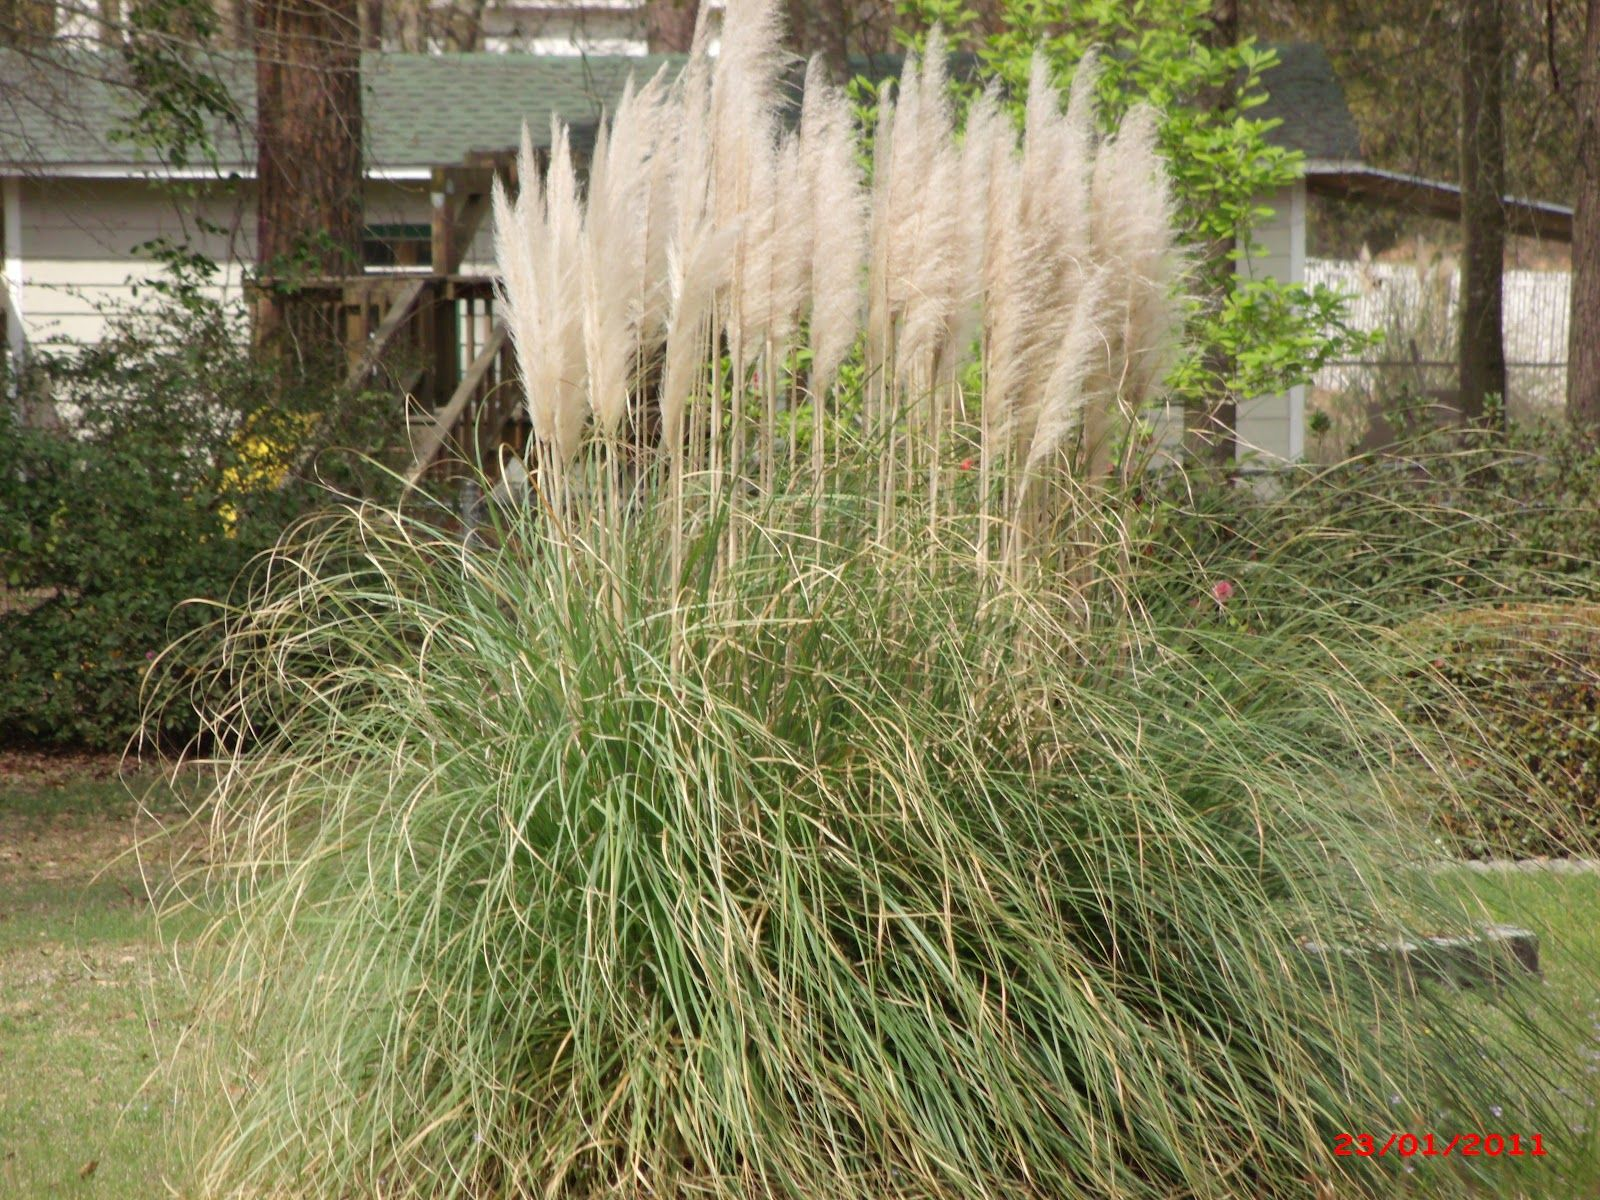 Tall Decorative Grass Ornamental Grass Like This Pampas Grass Are Popular Landscape